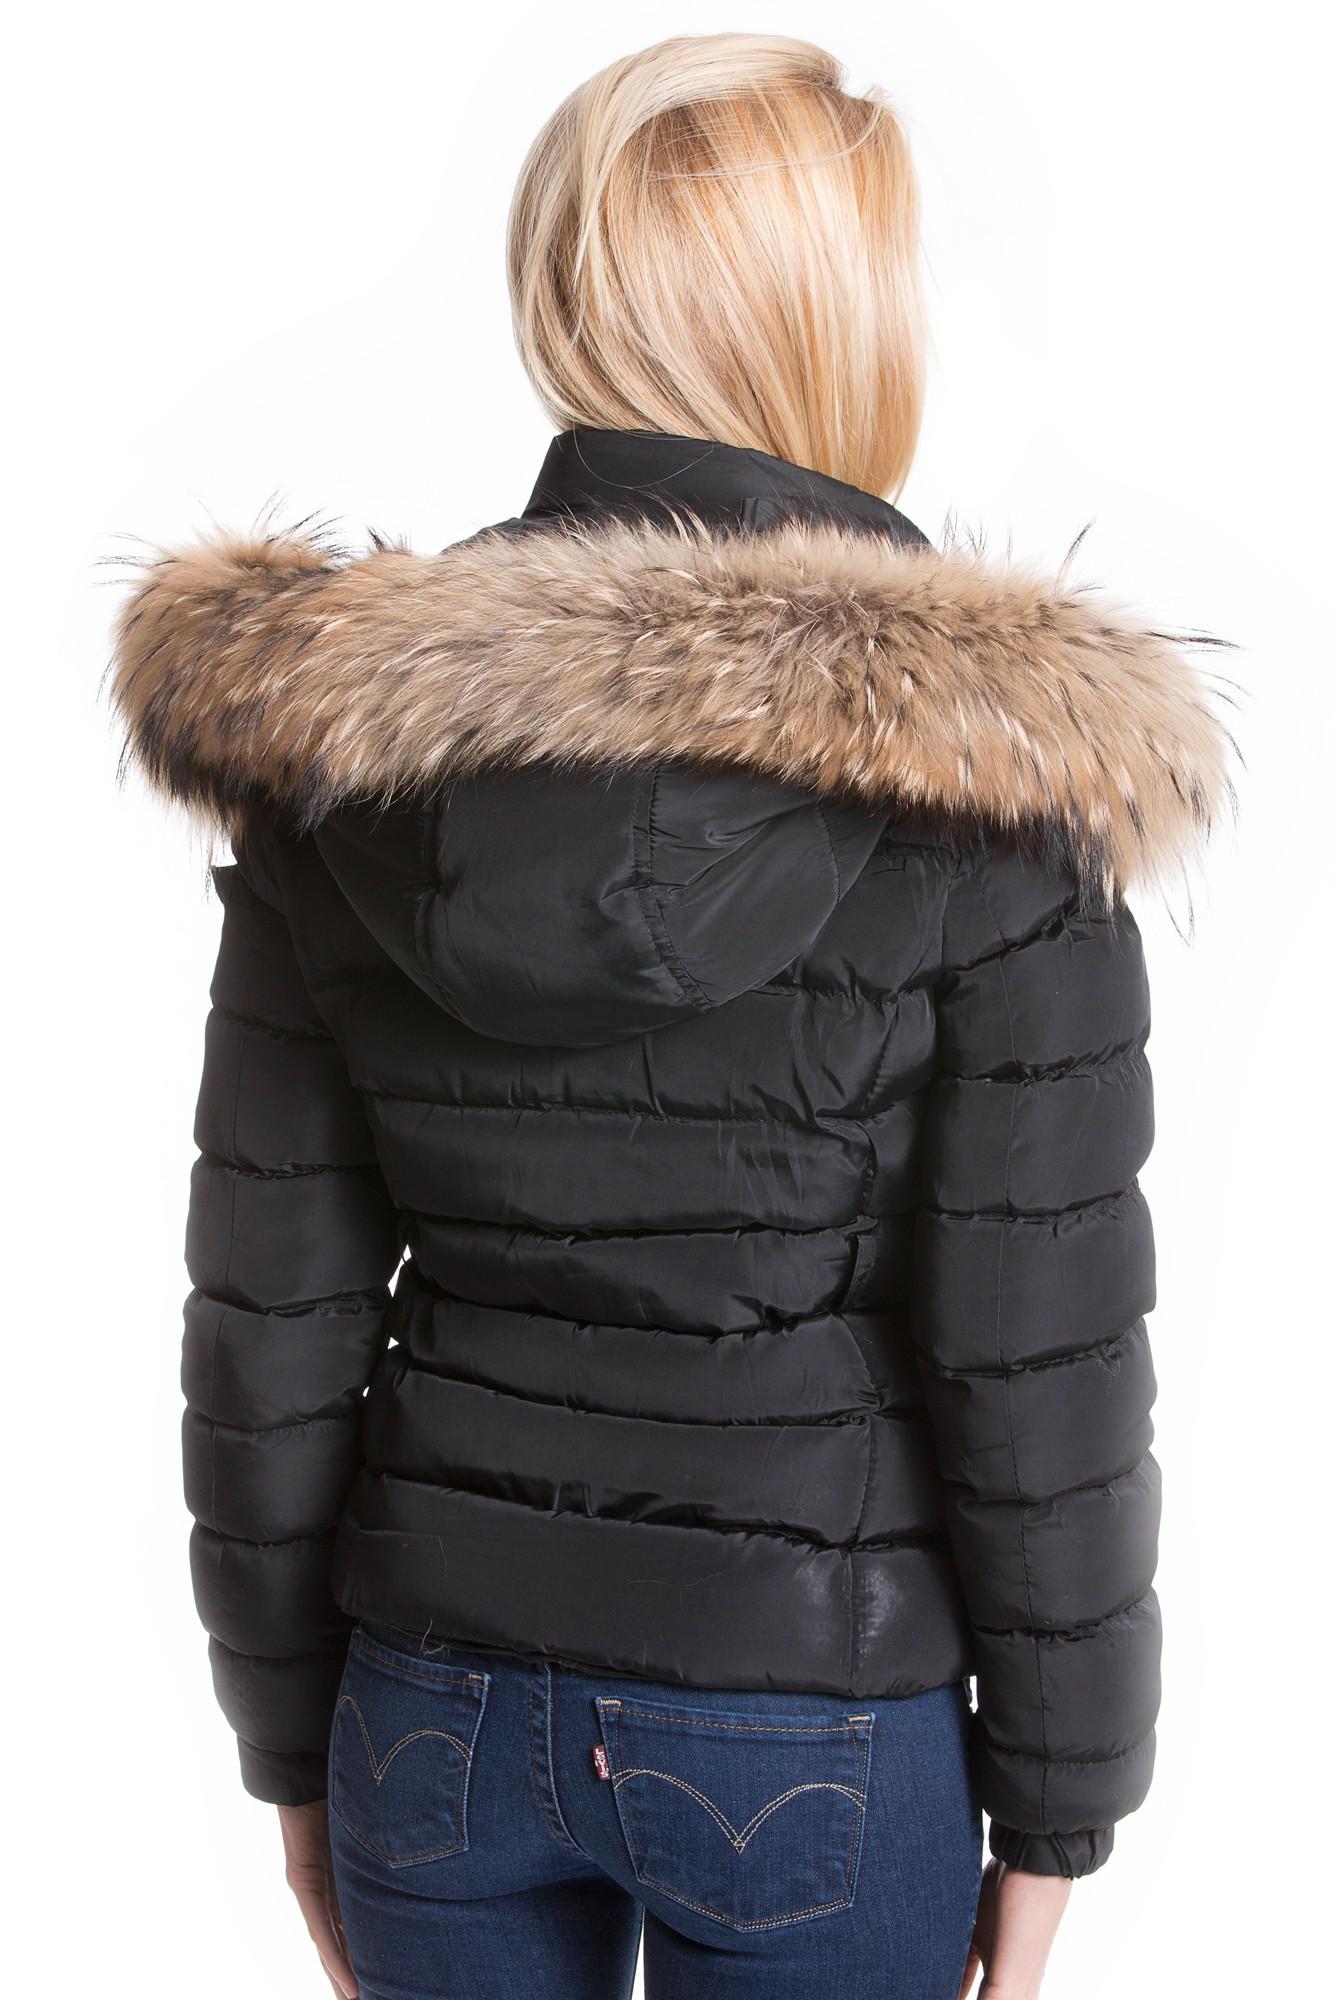 parka fellkapuze anfertigen fell style fashion pelz kragen kaufen im dein pelz online shop. Black Bedroom Furniture Sets. Home Design Ideas